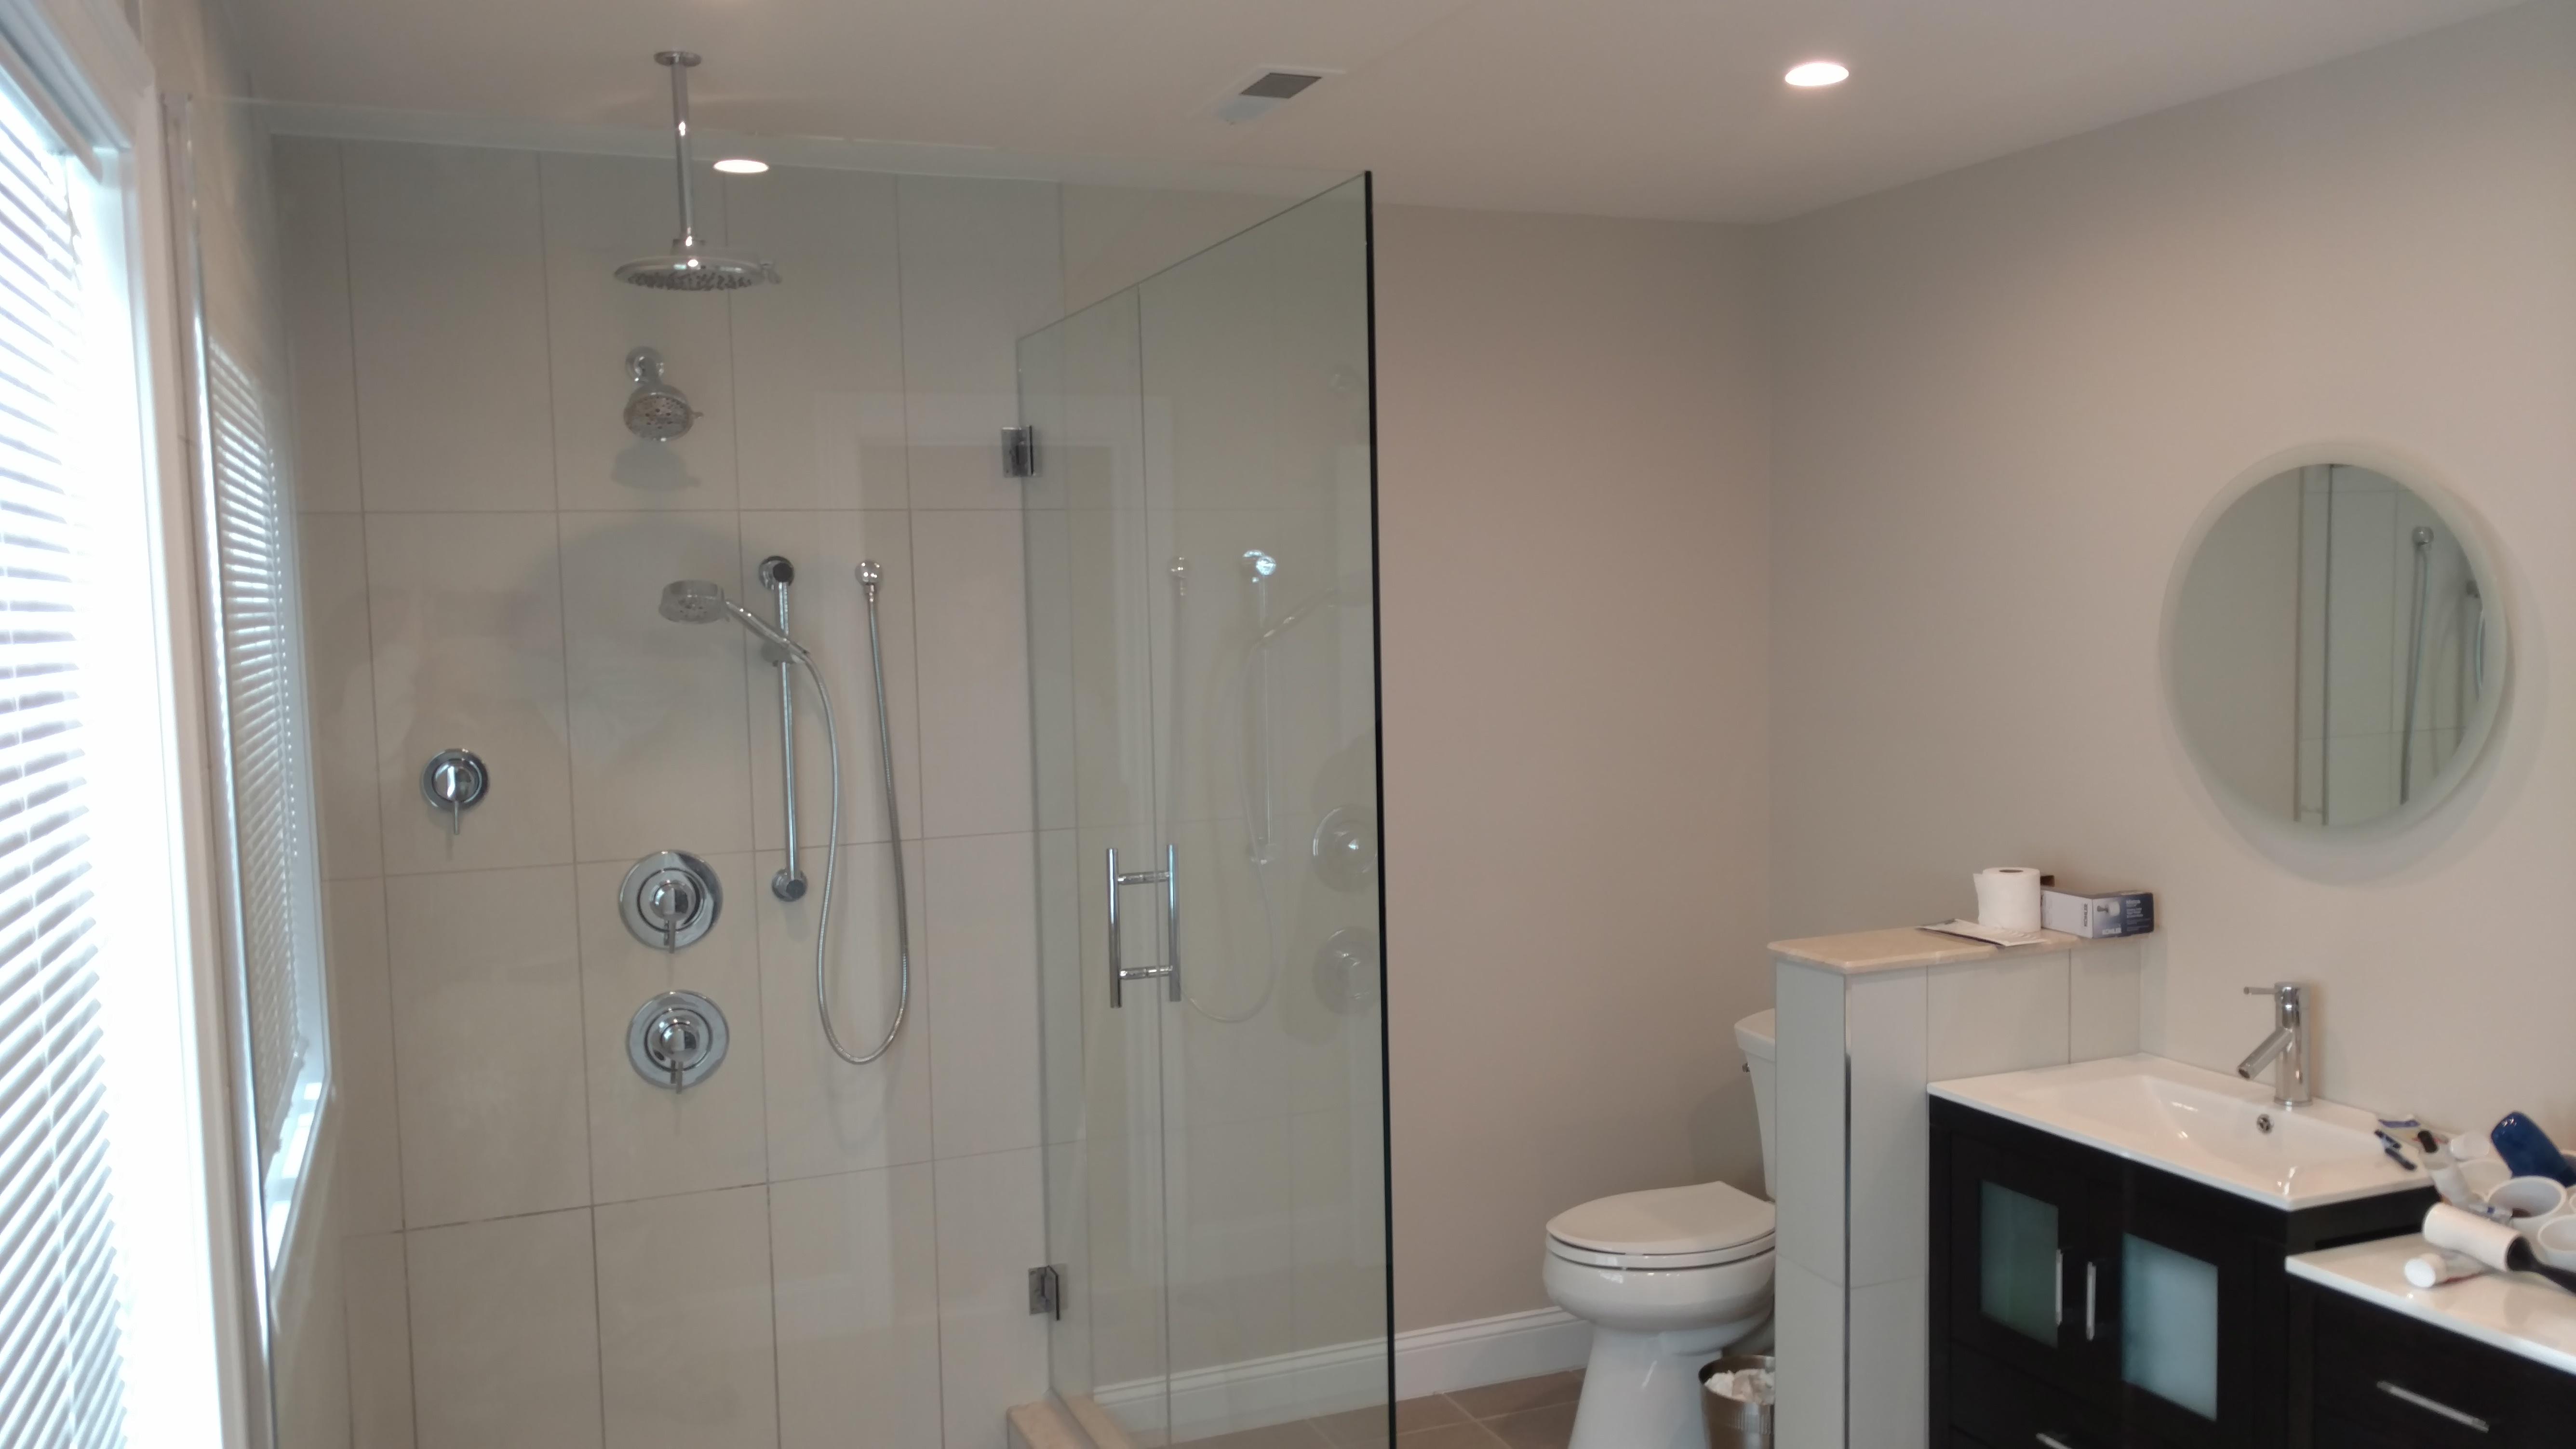 bathroom remodeling Plymouth CT | Alan Dinsmoor Contracting